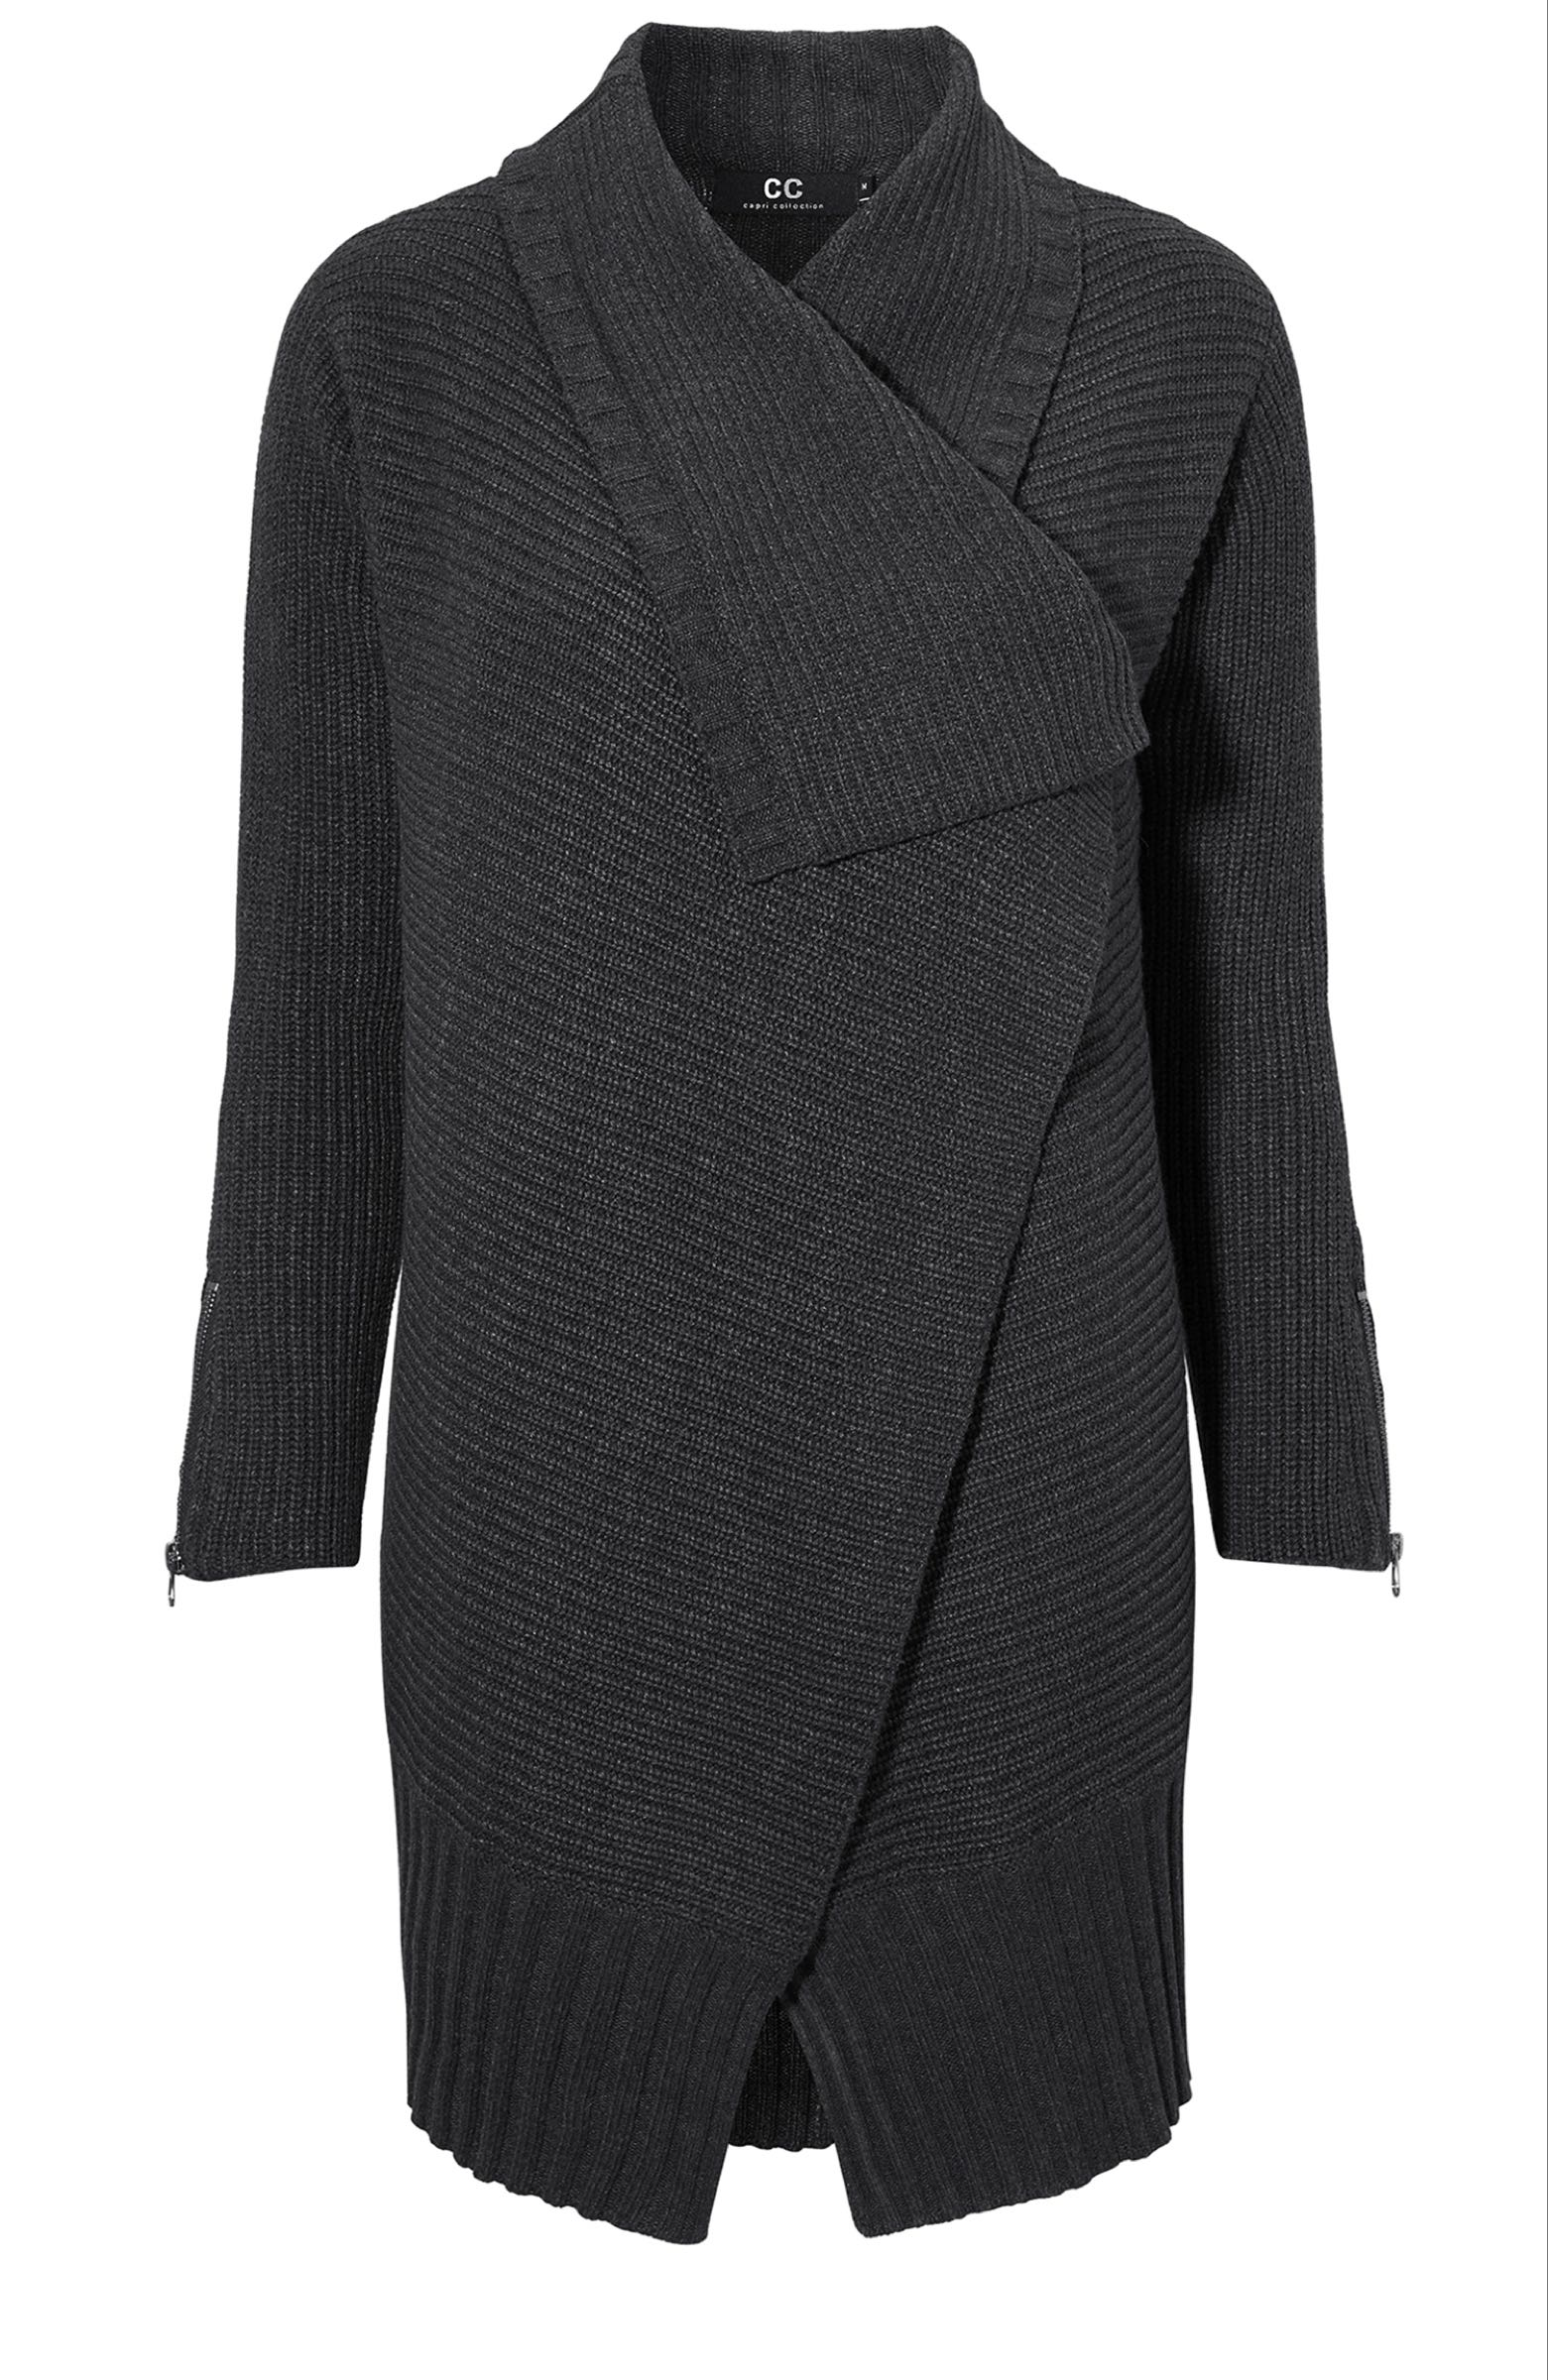 Choen cardigan, black/melange